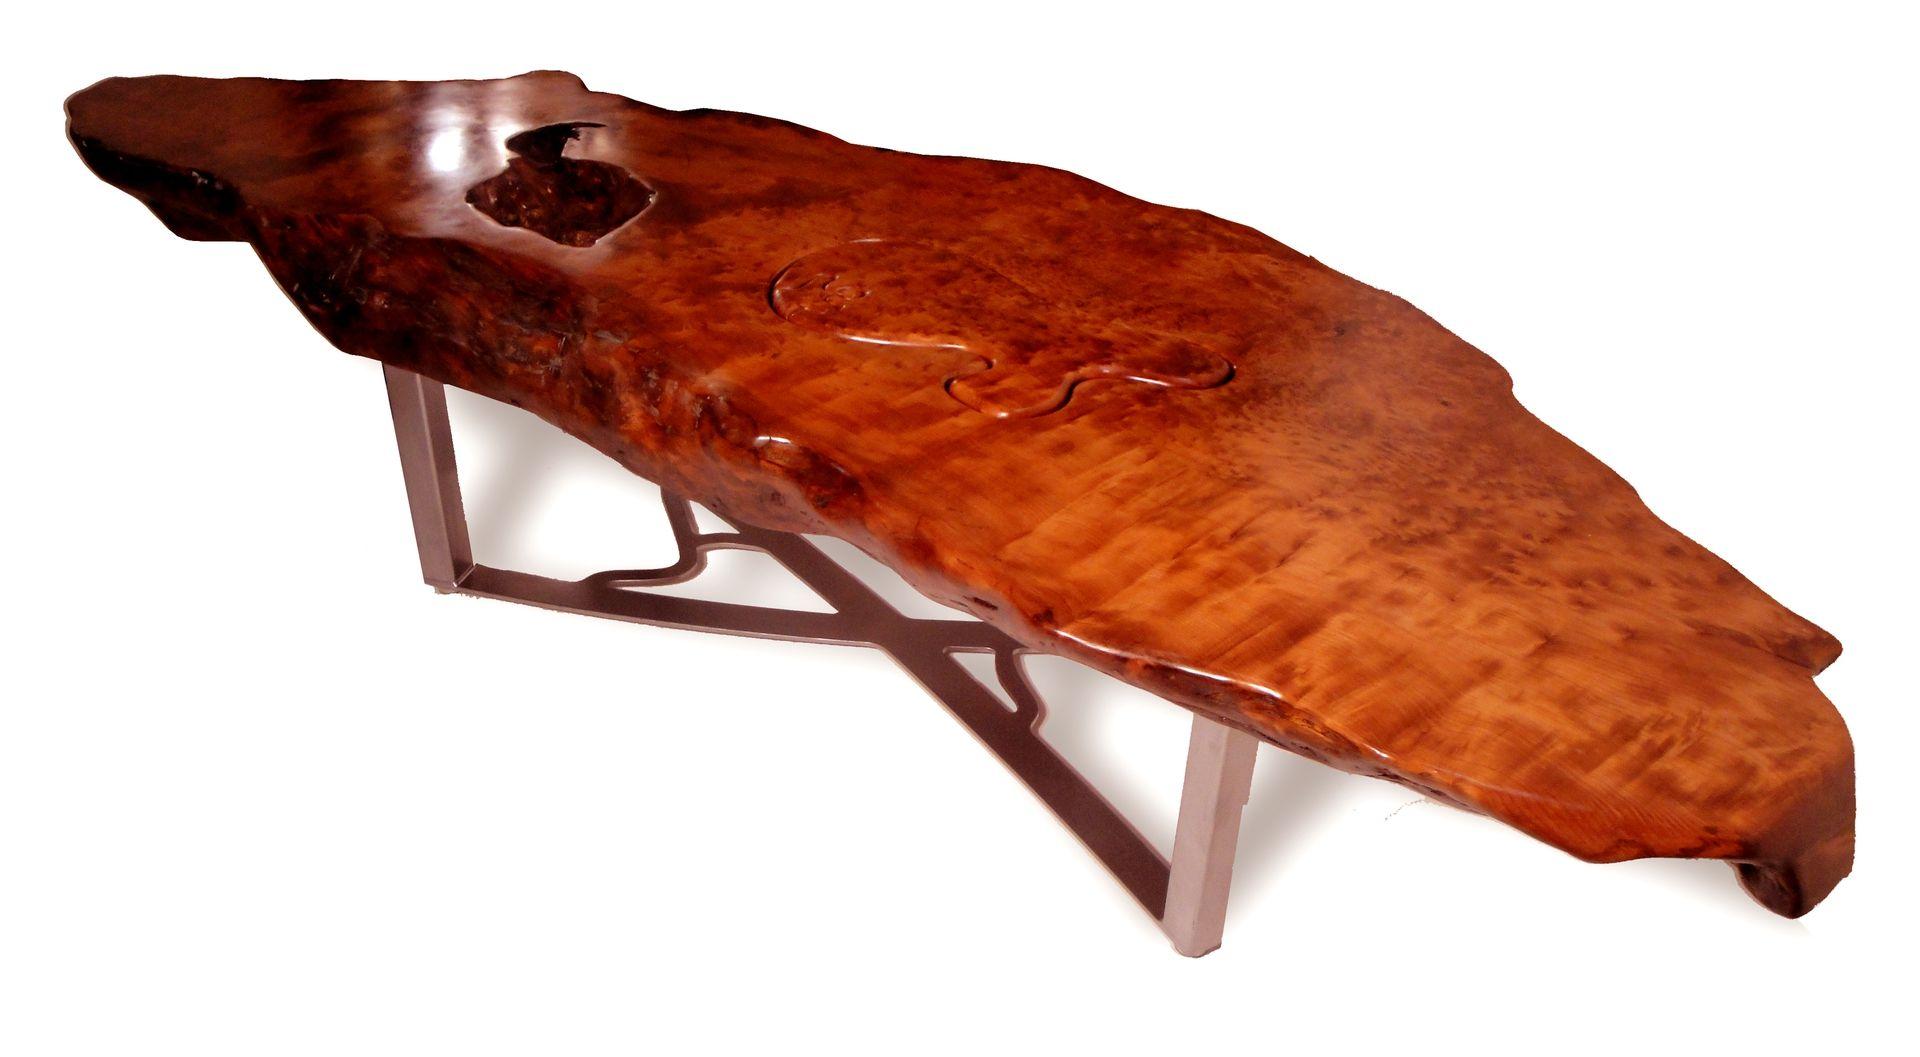 Custom Made Redwood Burl Coffee Table By Scott Dworkin Designs